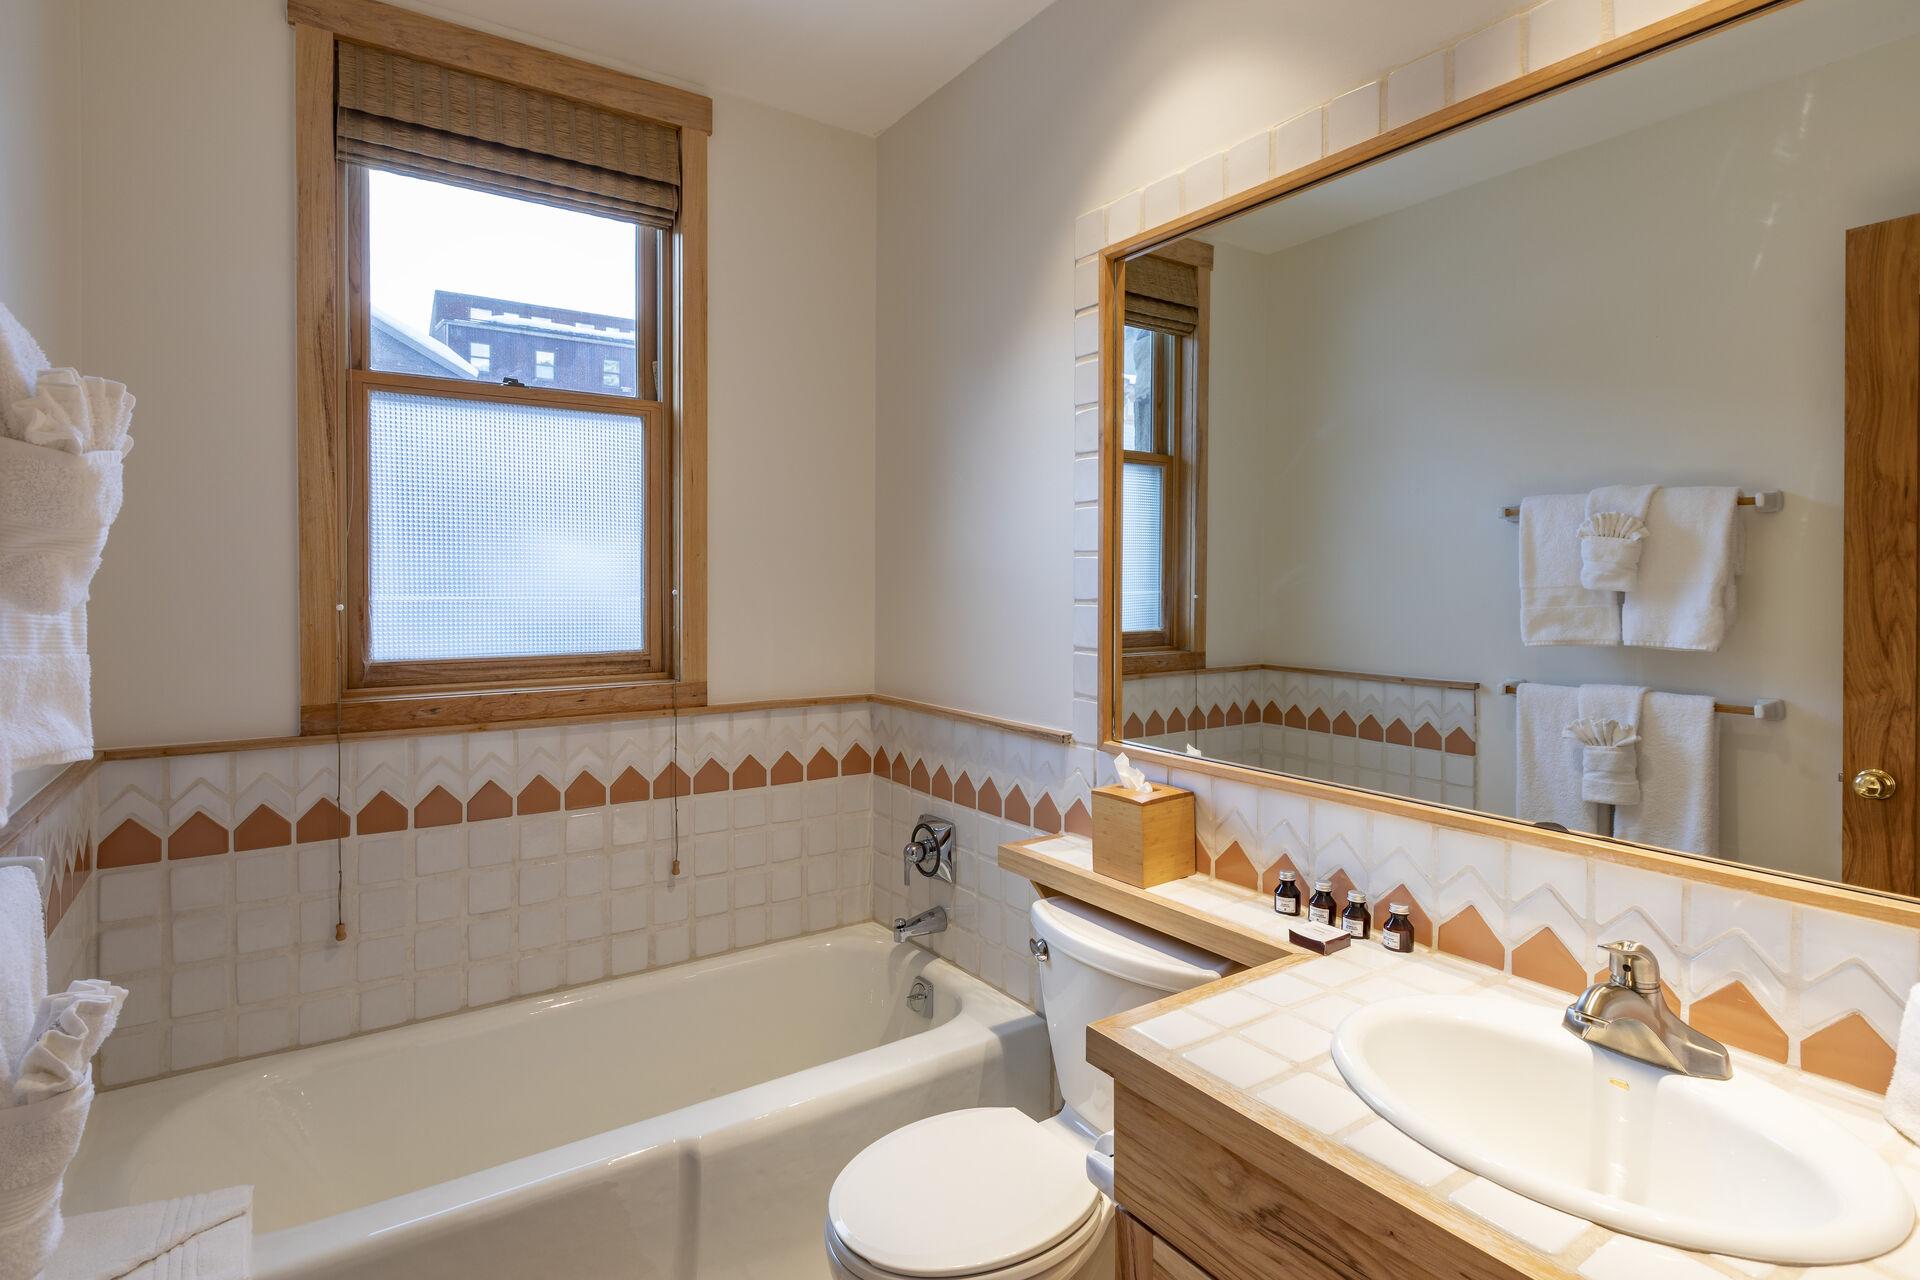 Bathroom with vanity sink, toilet, and tub.